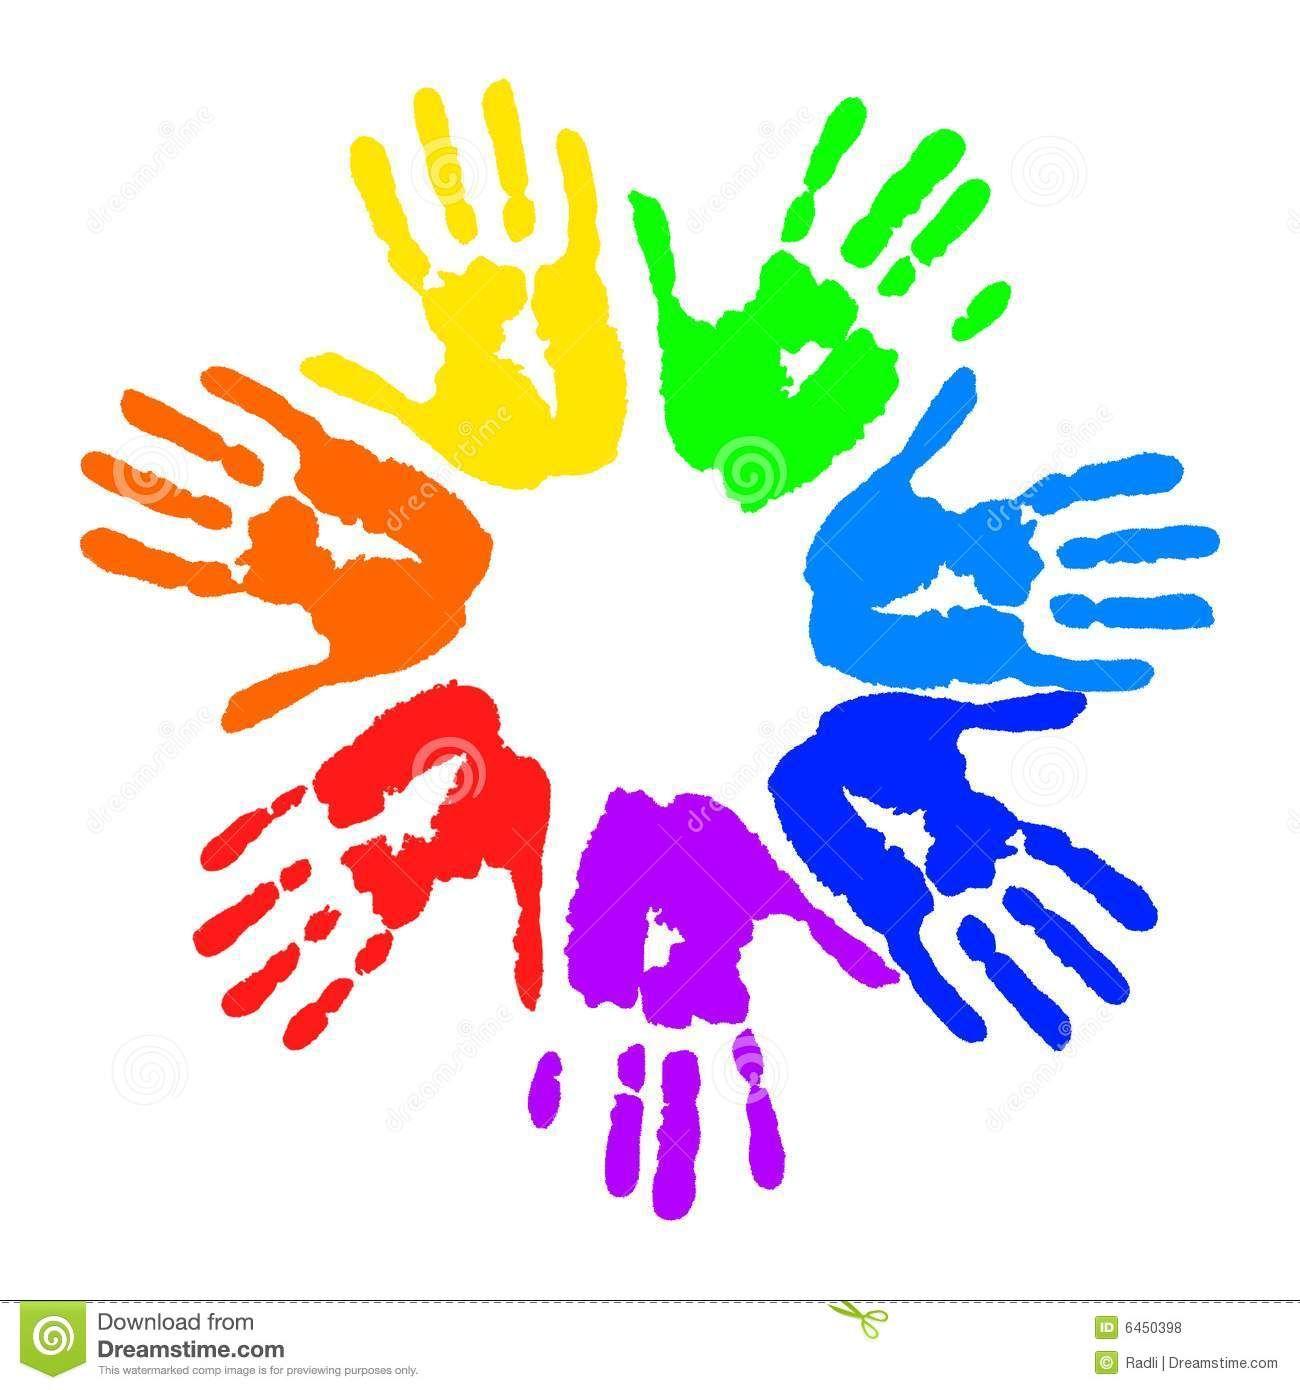 Handprint clipart circle. Pics for kids craft